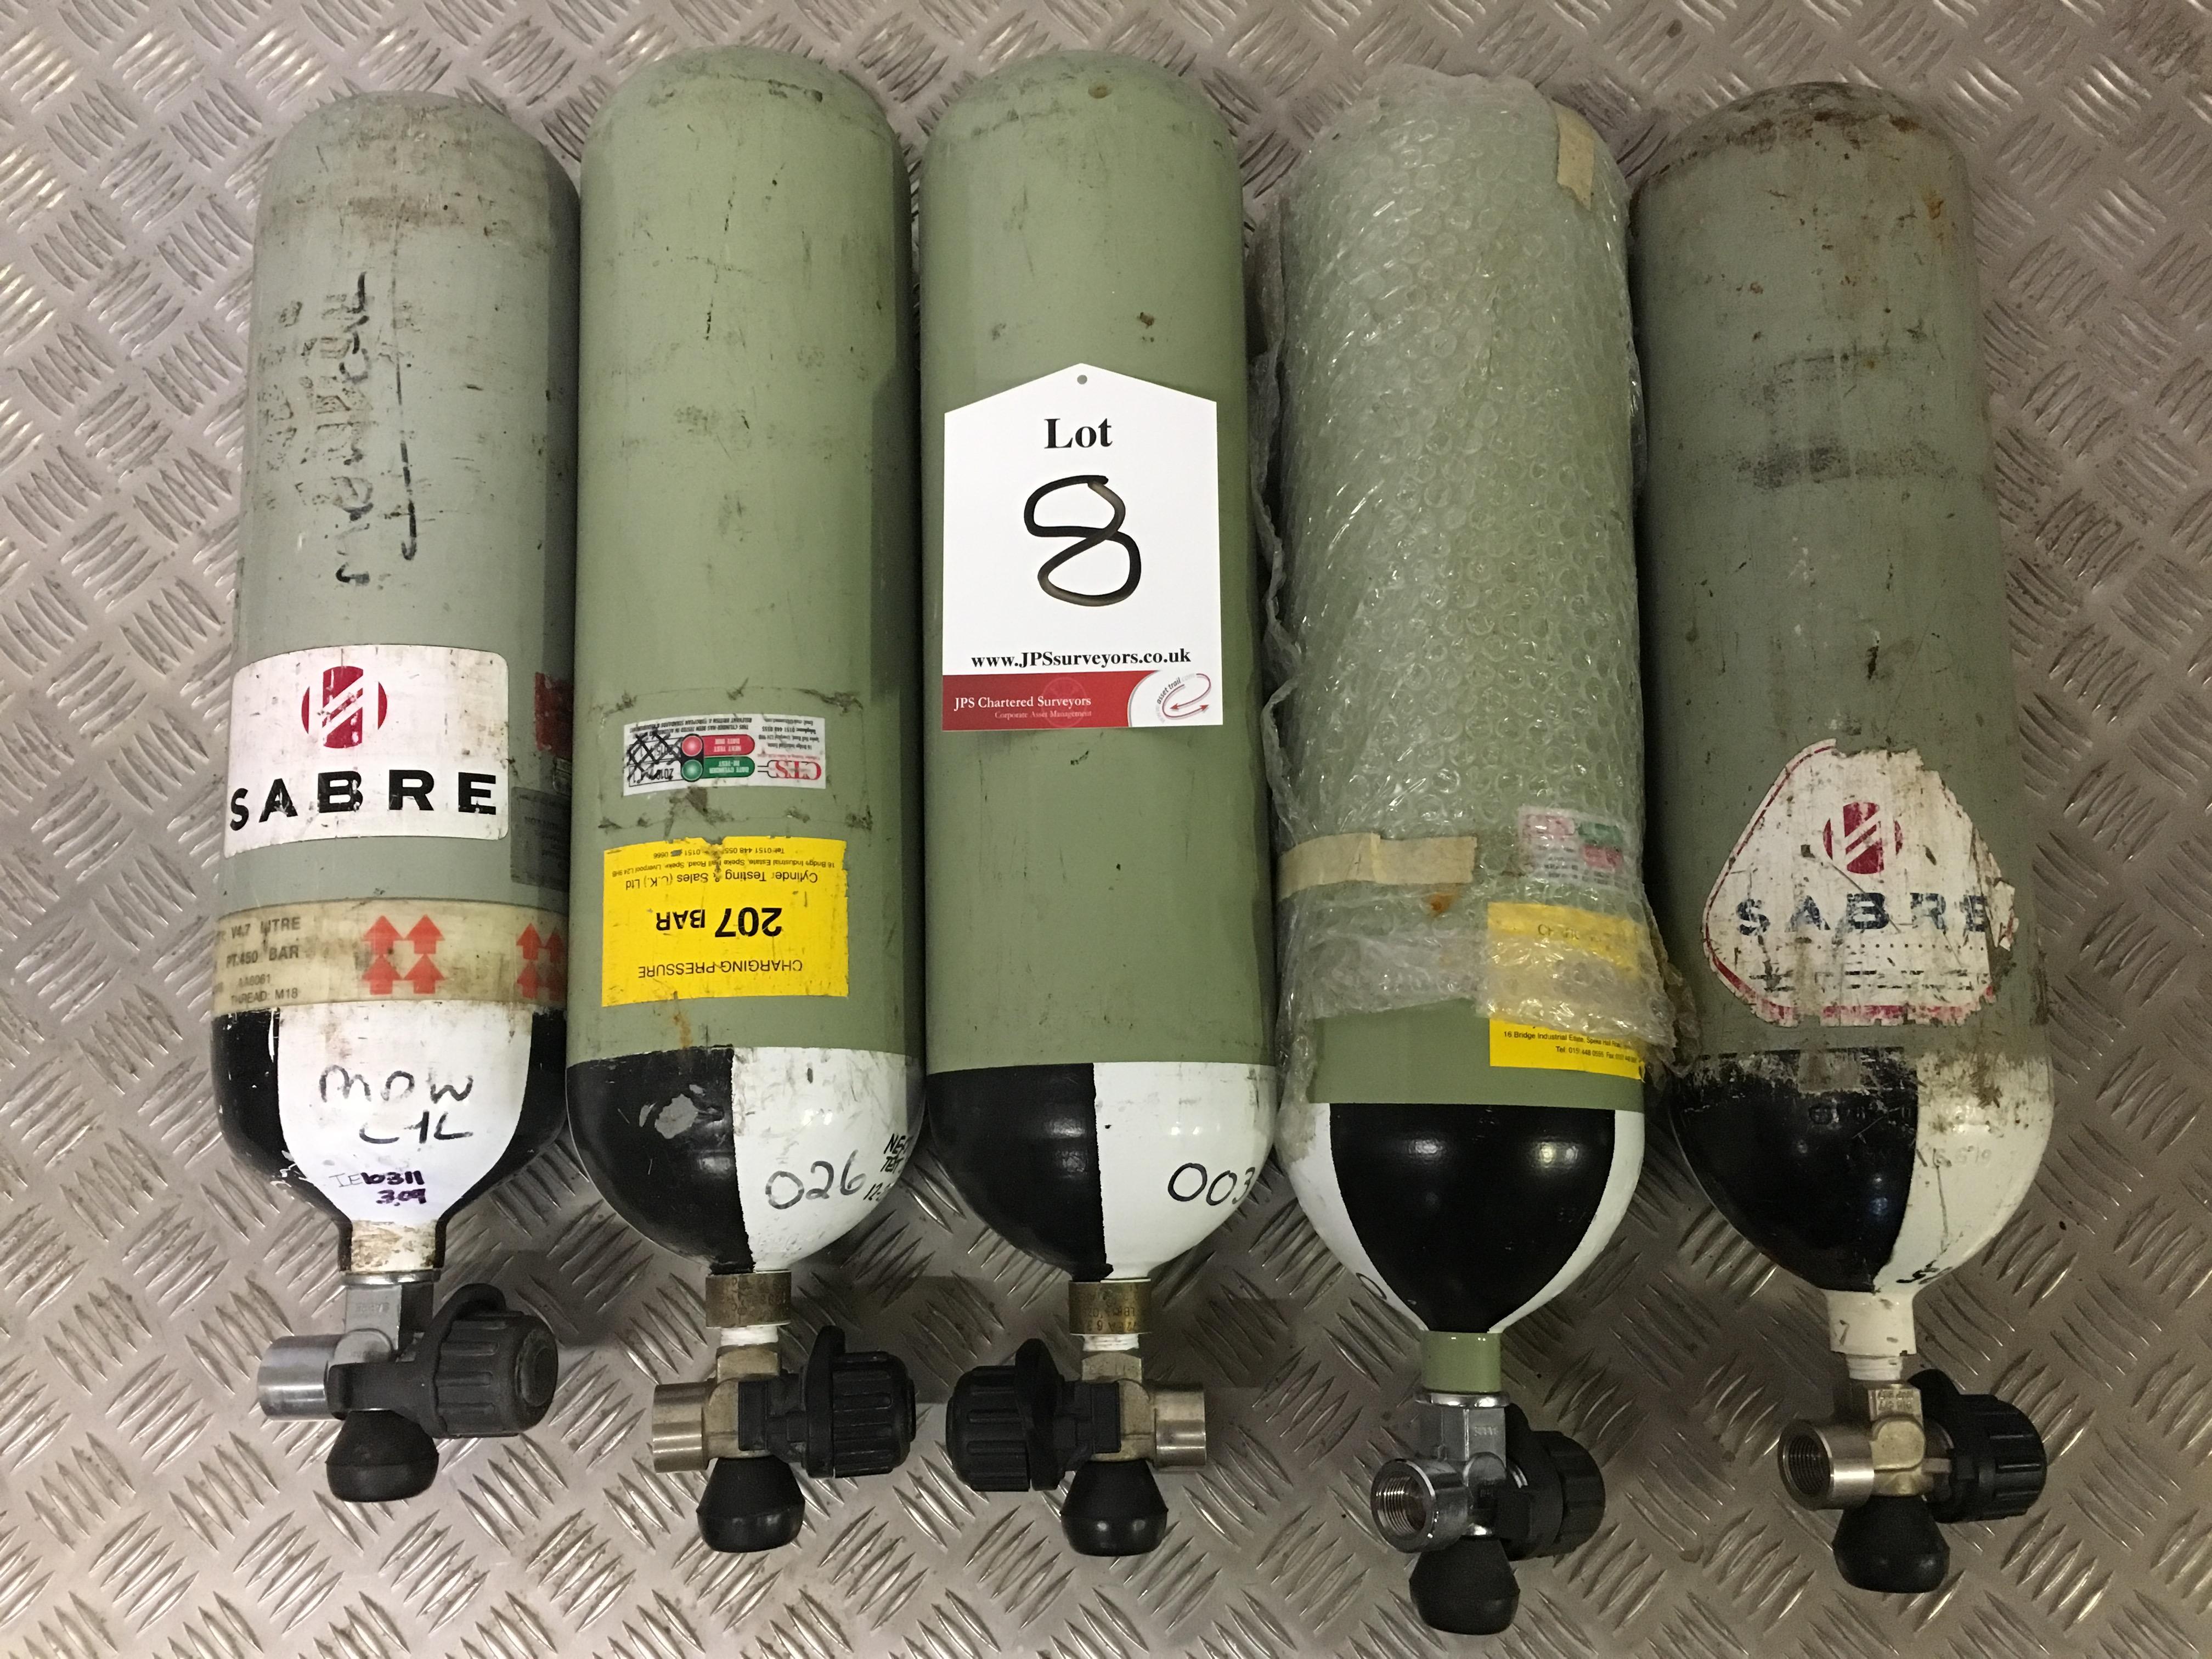 Lot 8 - 5 x Sabre 200 Bar Compressed Air Cylinder with Saver Valves